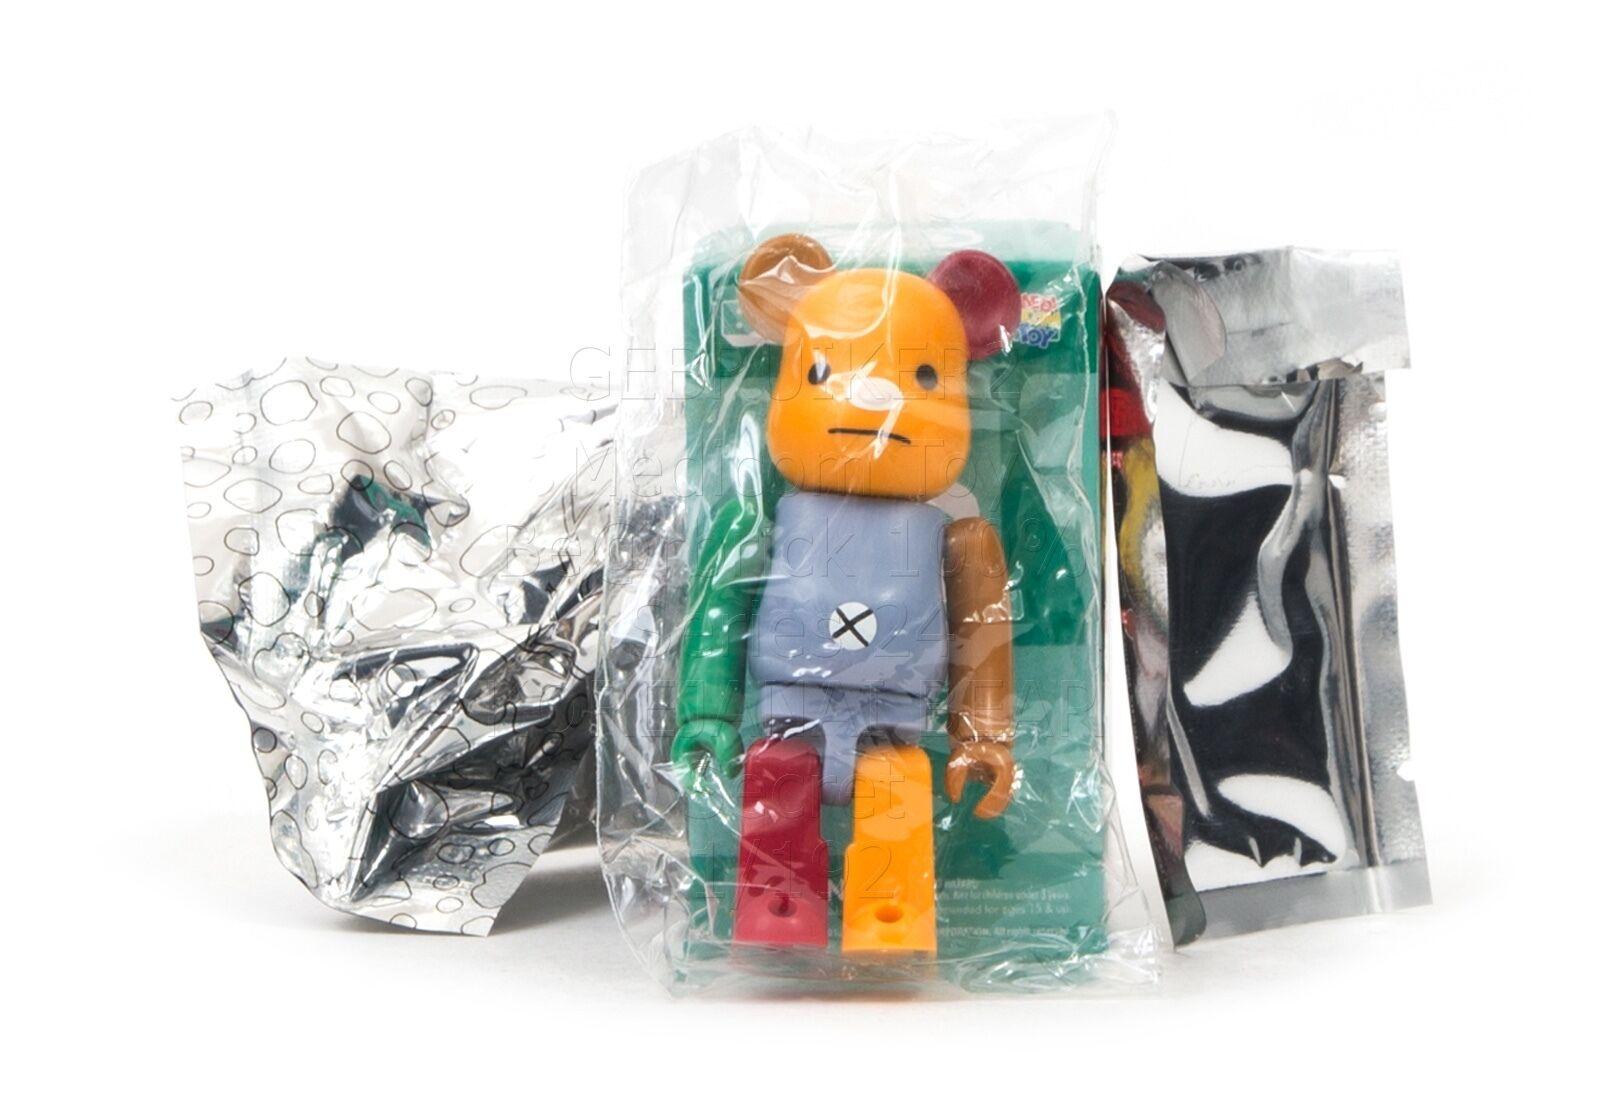 Medicom Toy Bearbrick Series 24 SECRET ZARIGANIWORKS korejanai bear brick 100%